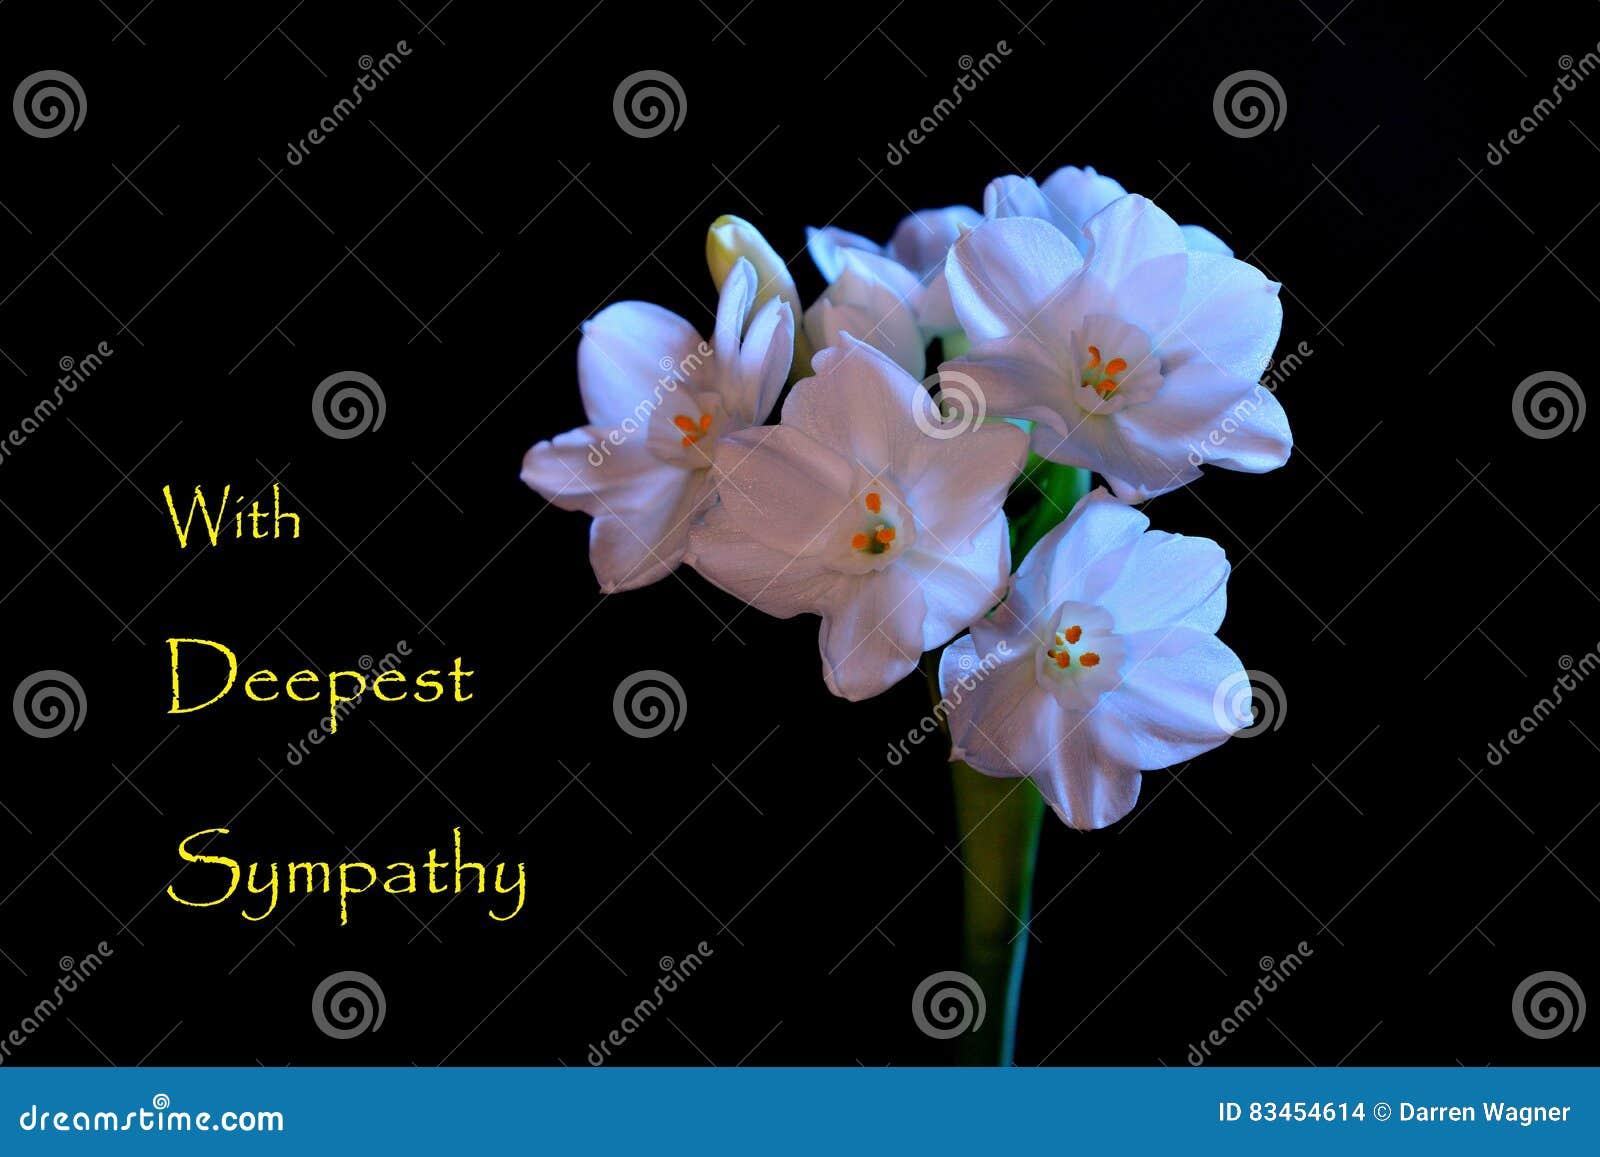 download sympathy card stock photo image of background condolences 83454614